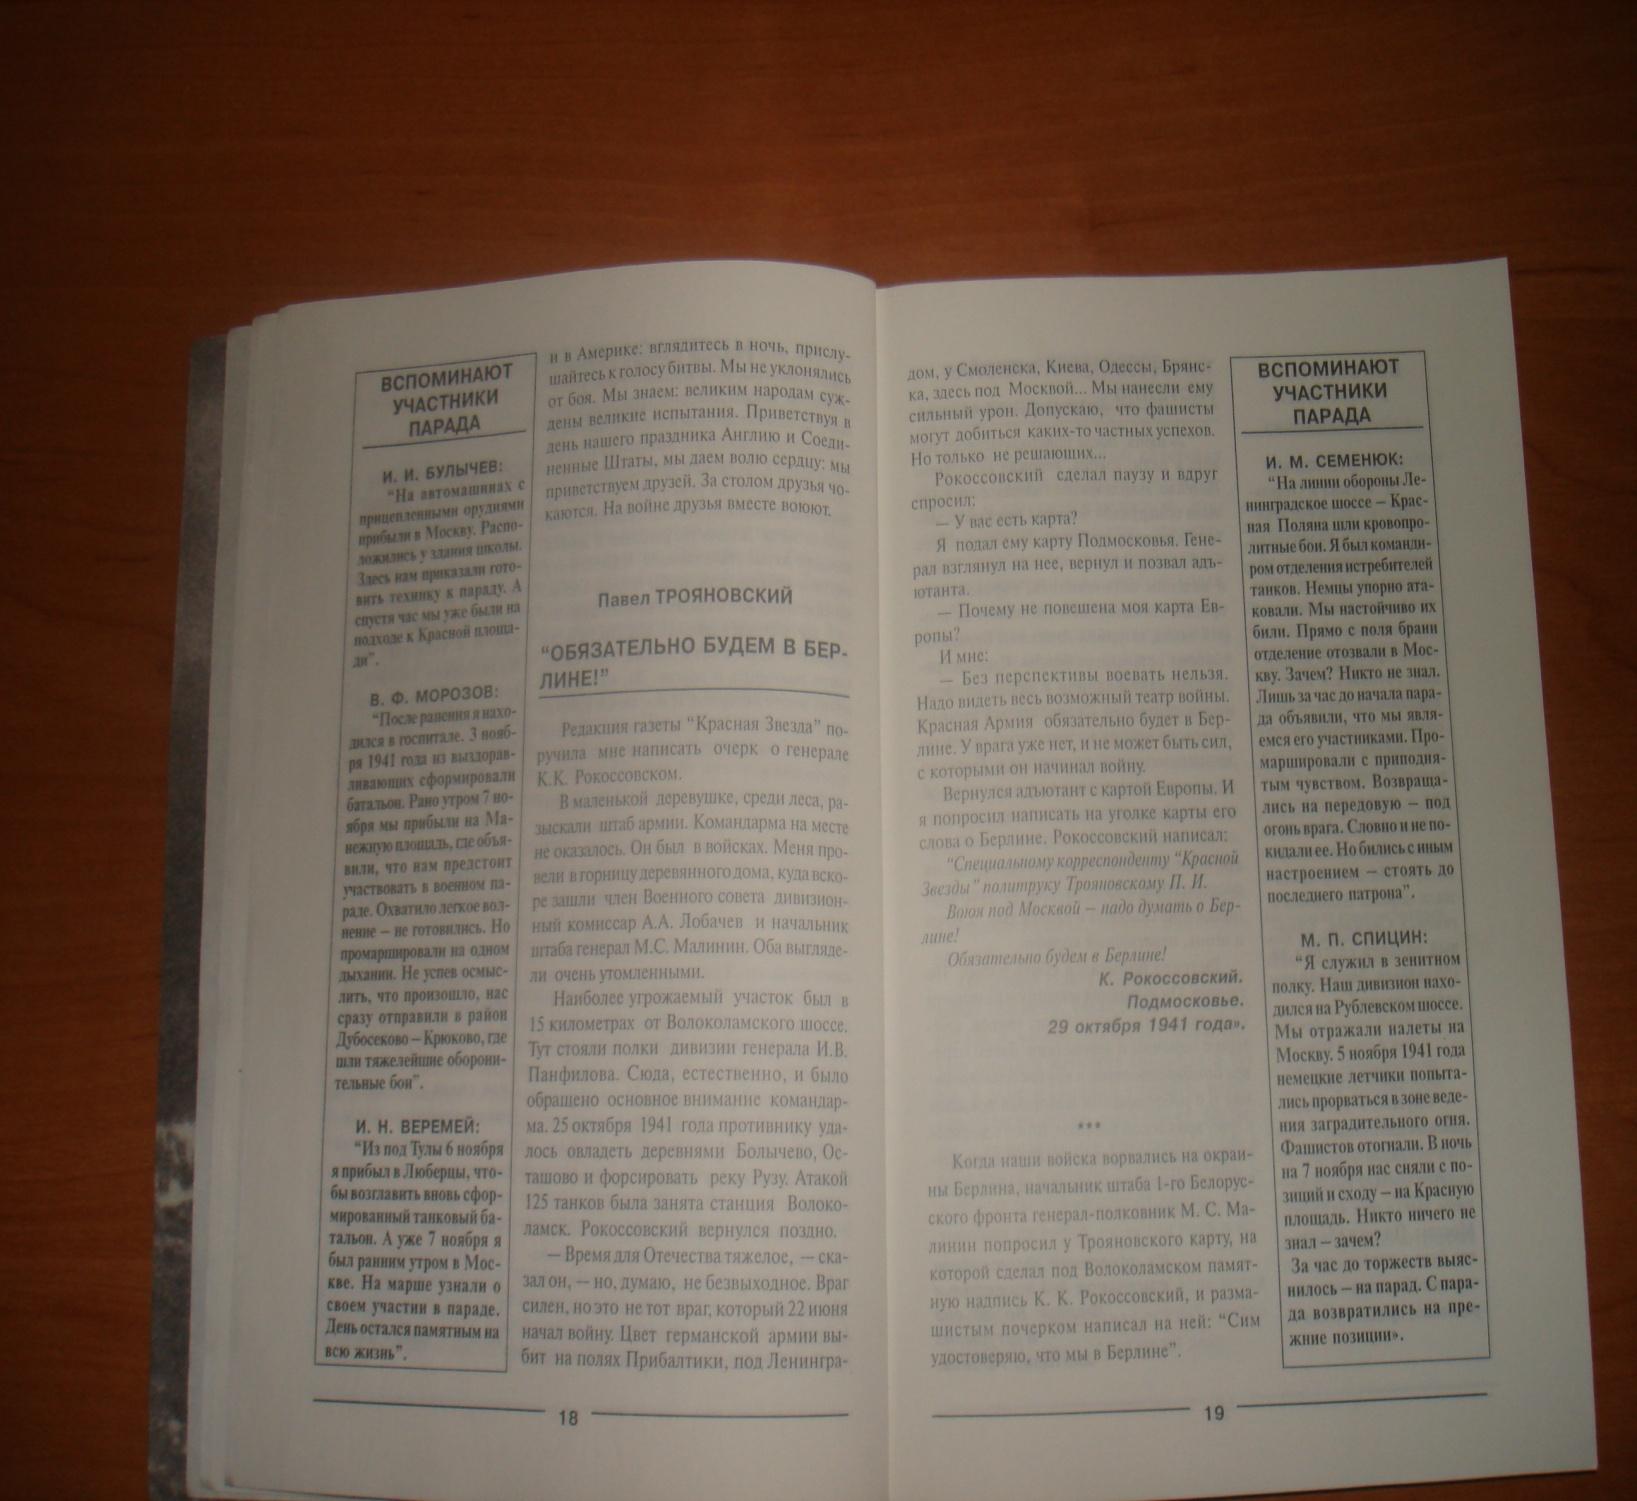 C:\Documents and Settings\привет киса\Рабочий стол\Иван Иваныч\DSC01756.JPG